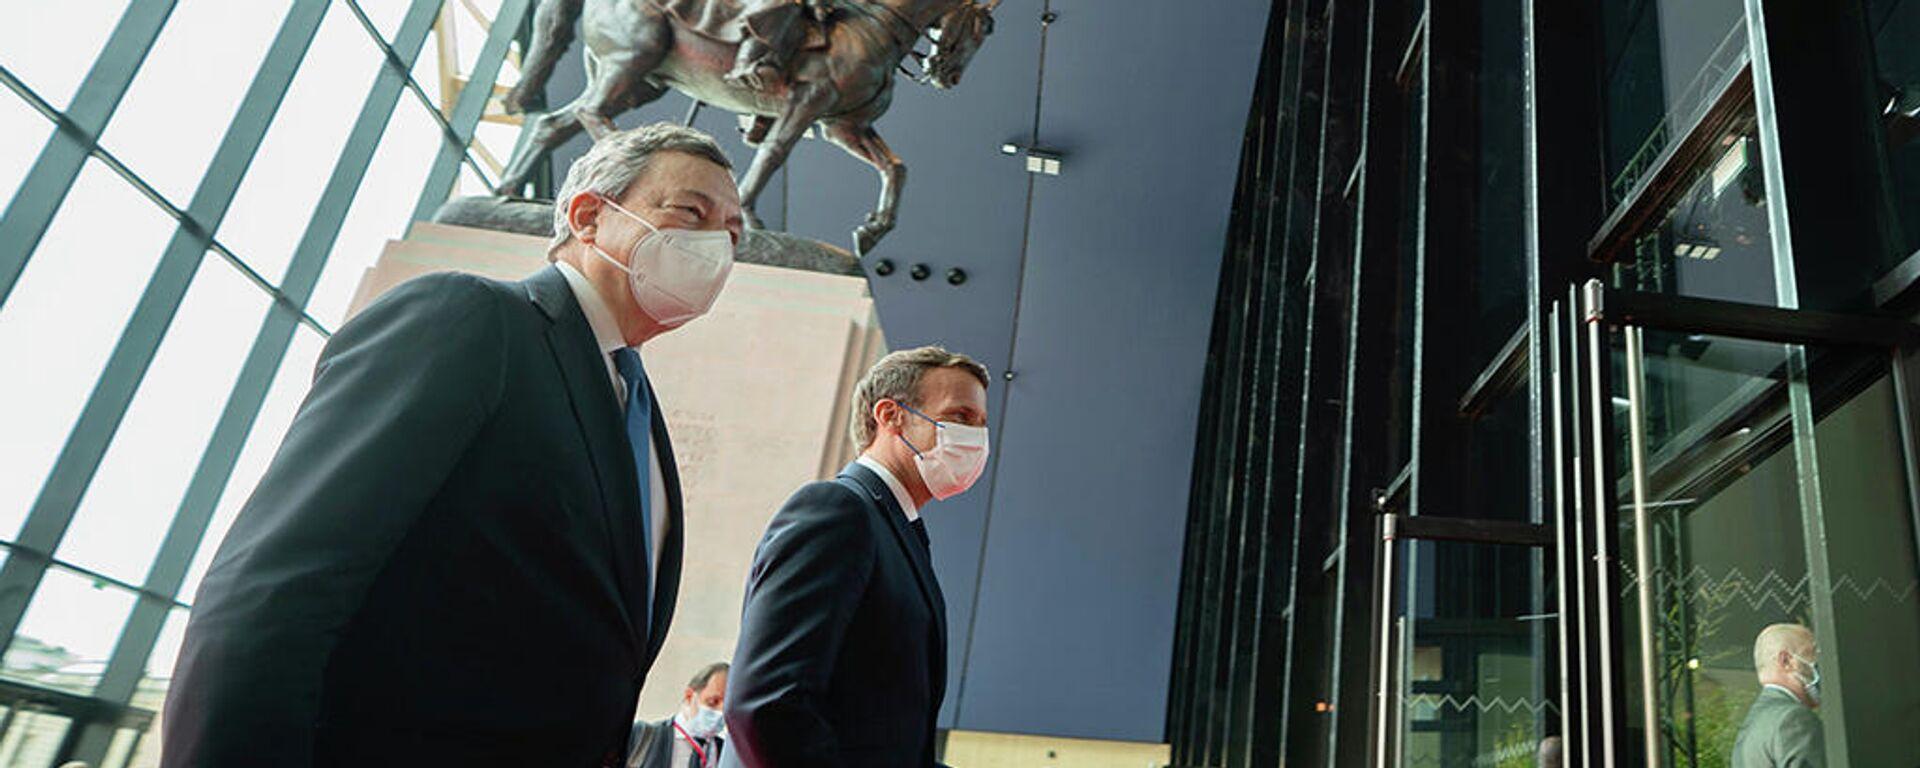 Macron e Draghi a Parigi - Sputnik Italia, 1920, 18.05.2021